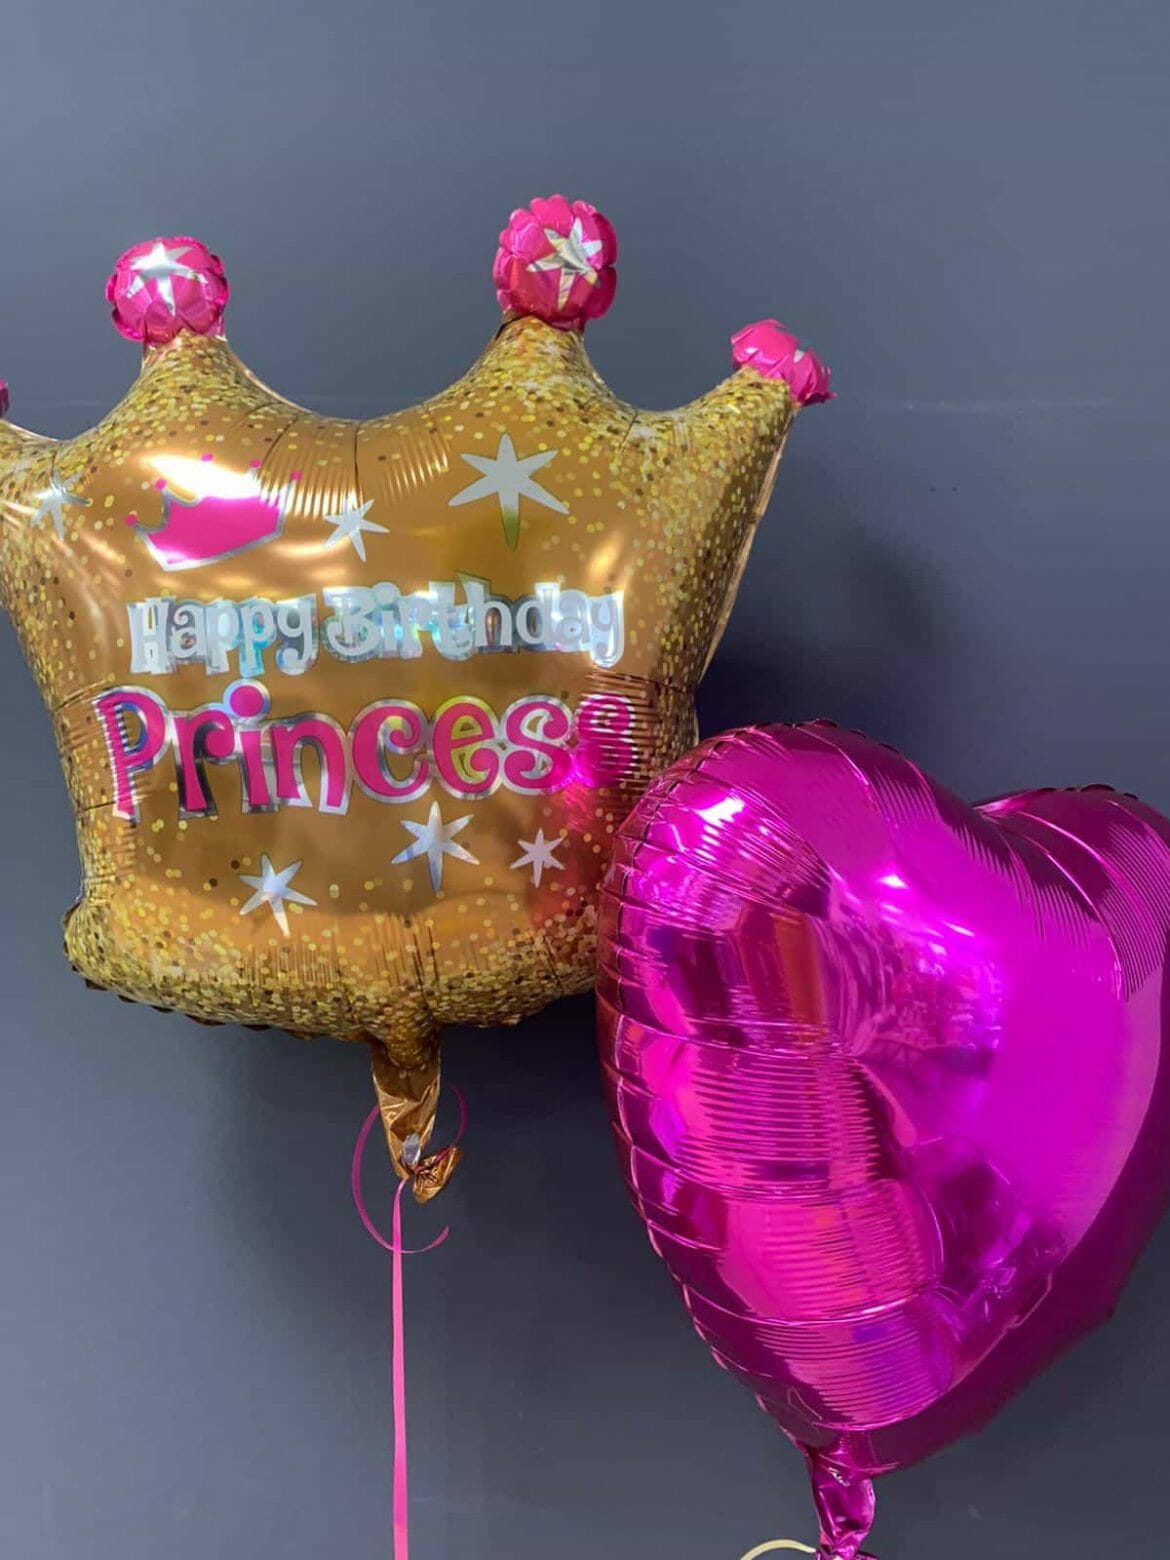 Happy Birthday Princess <br />Ballon Krone € 5,90 <br />Dekoherz lila € 4,50 1